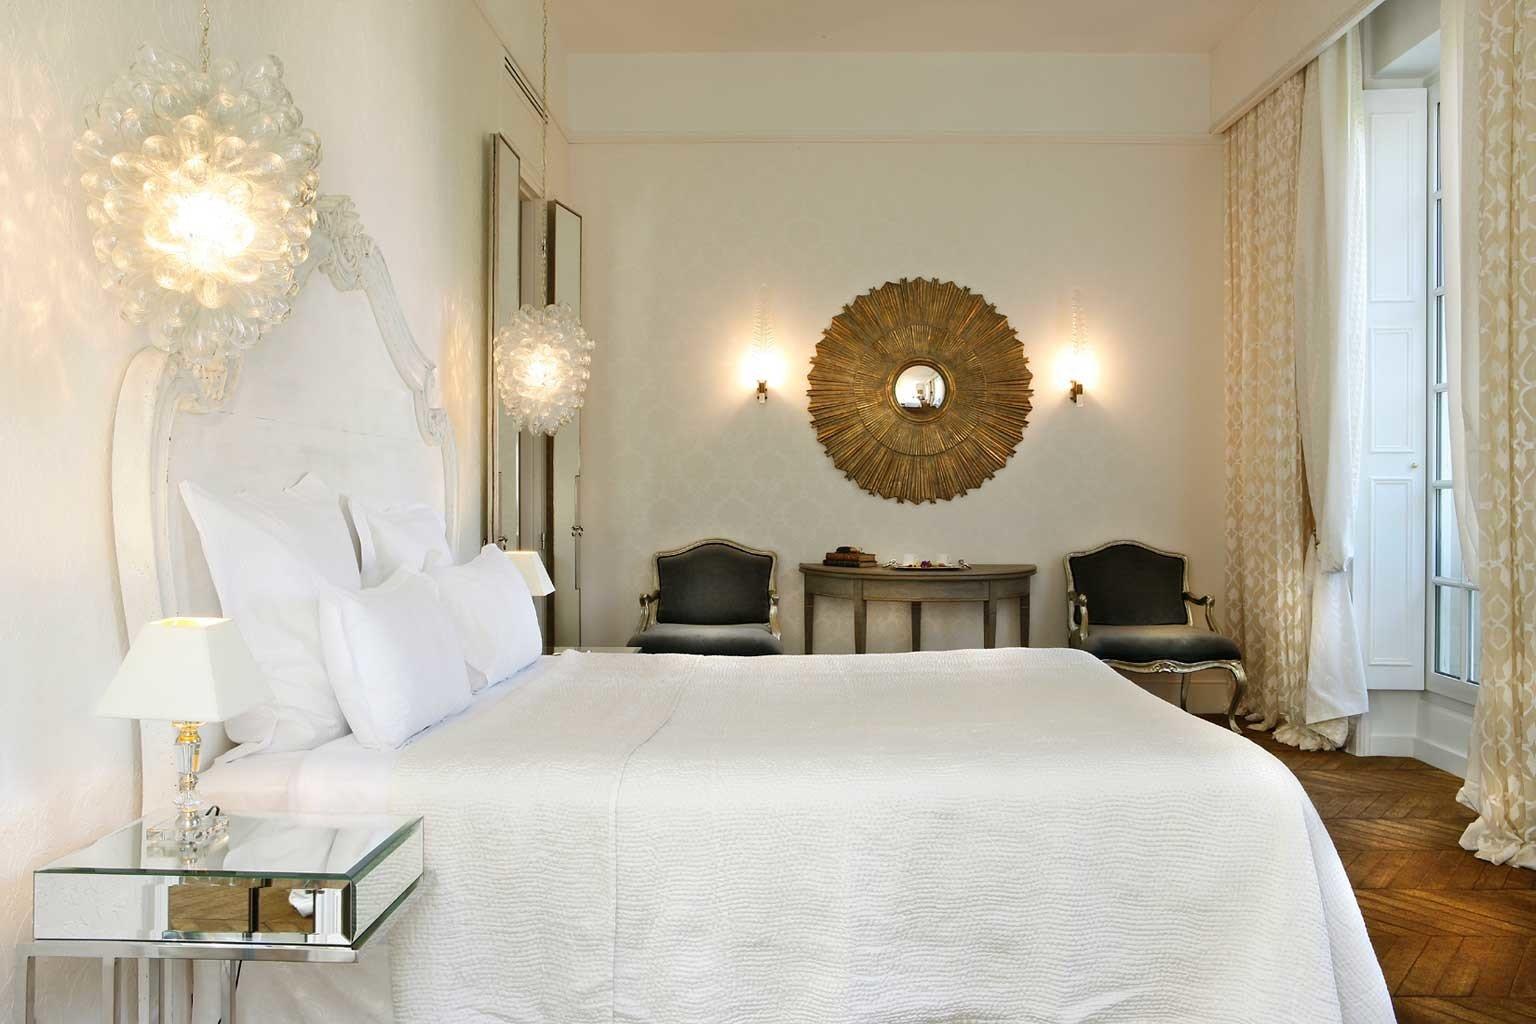 Bedroom City Elegant Historic Romantic property Suite white cottage living room